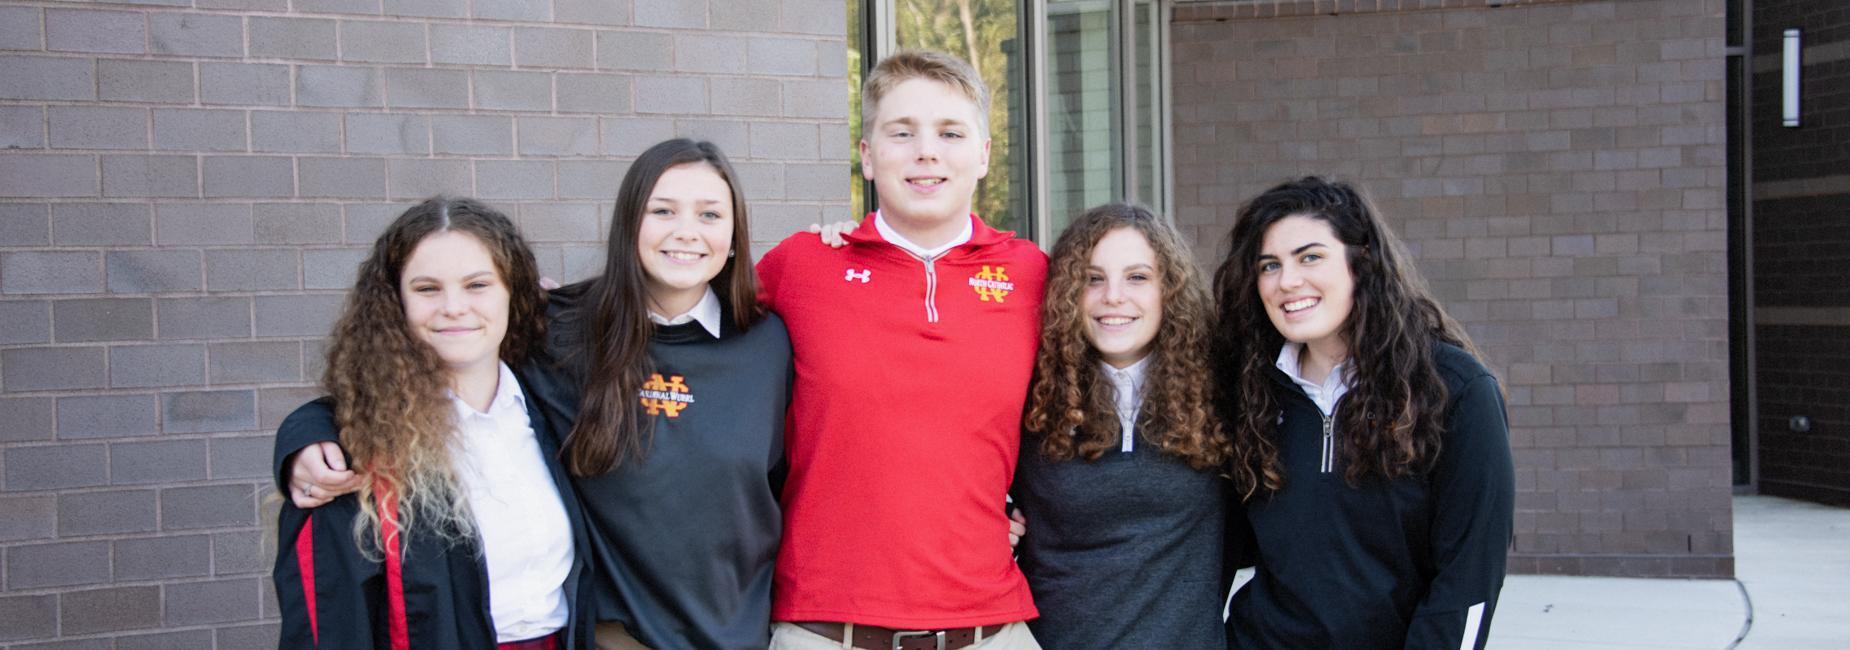 North Catholic High School Admissions